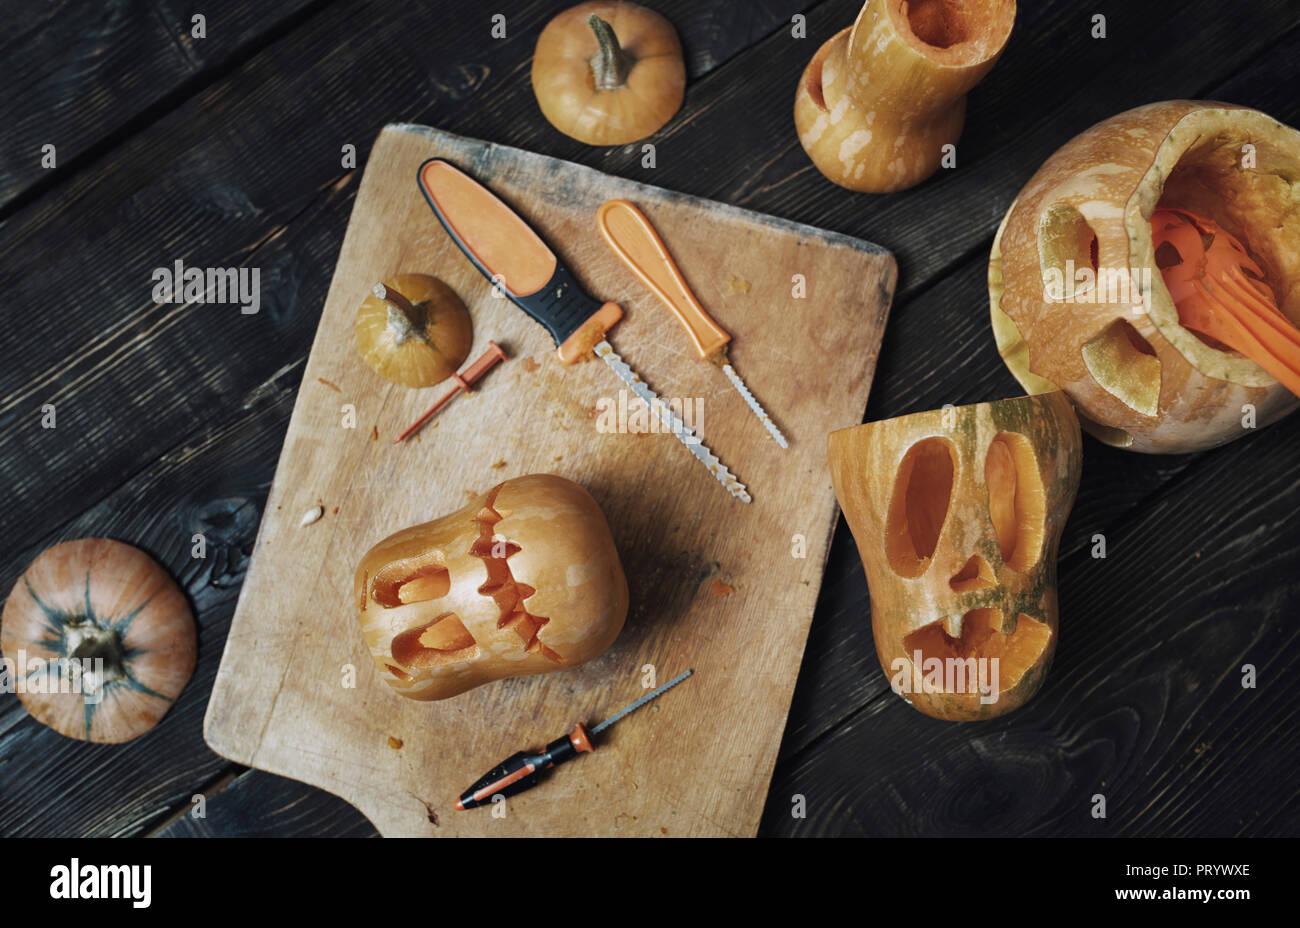 Halloween pumpkins, Jack O'Lanterns, carving knifes - Stock Image